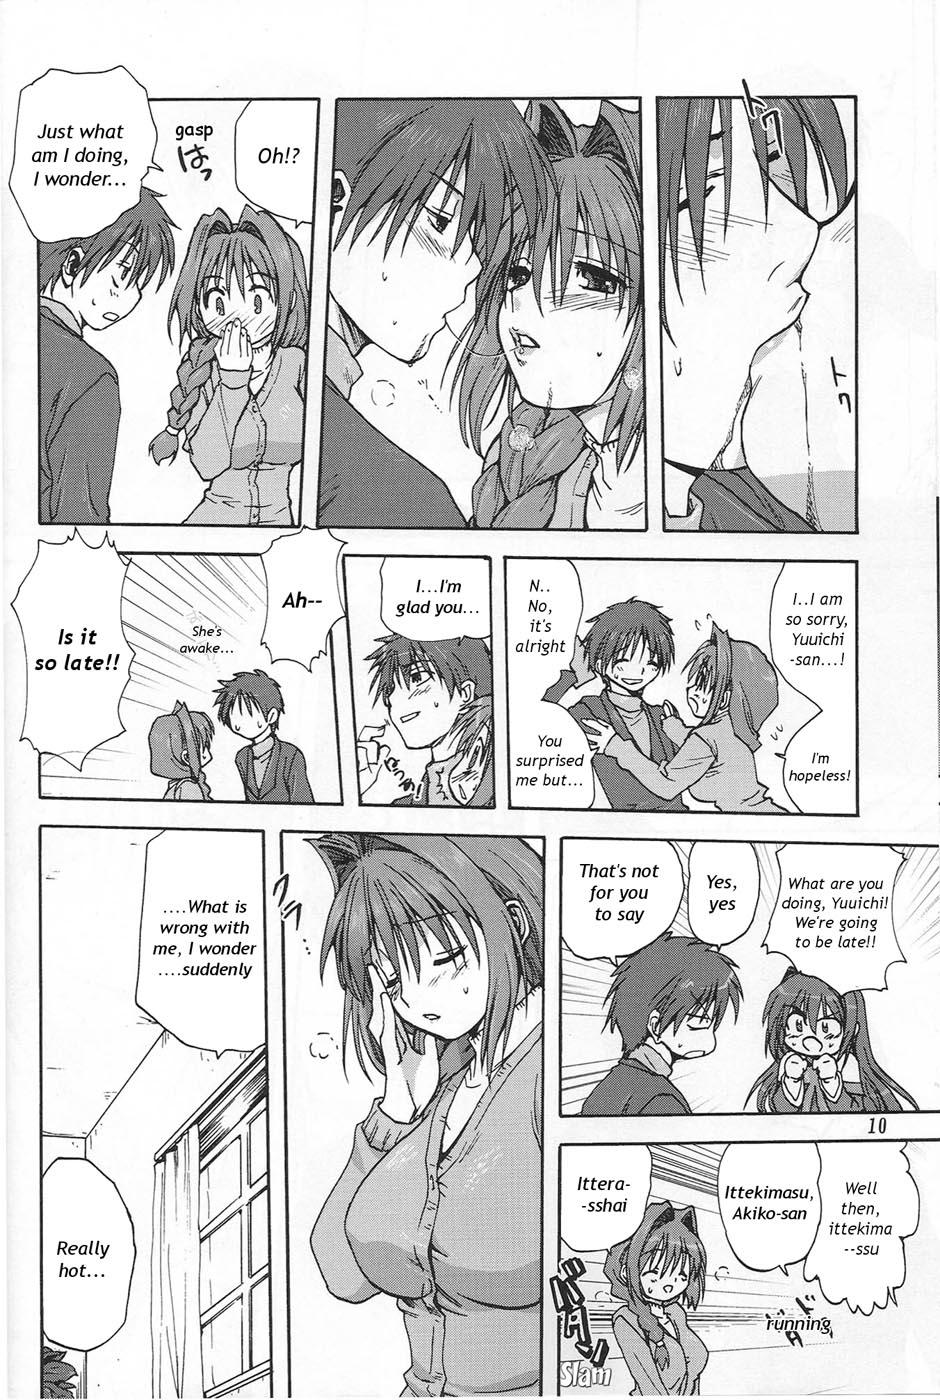 himenokouji akiko (oniai) I hate fairyland